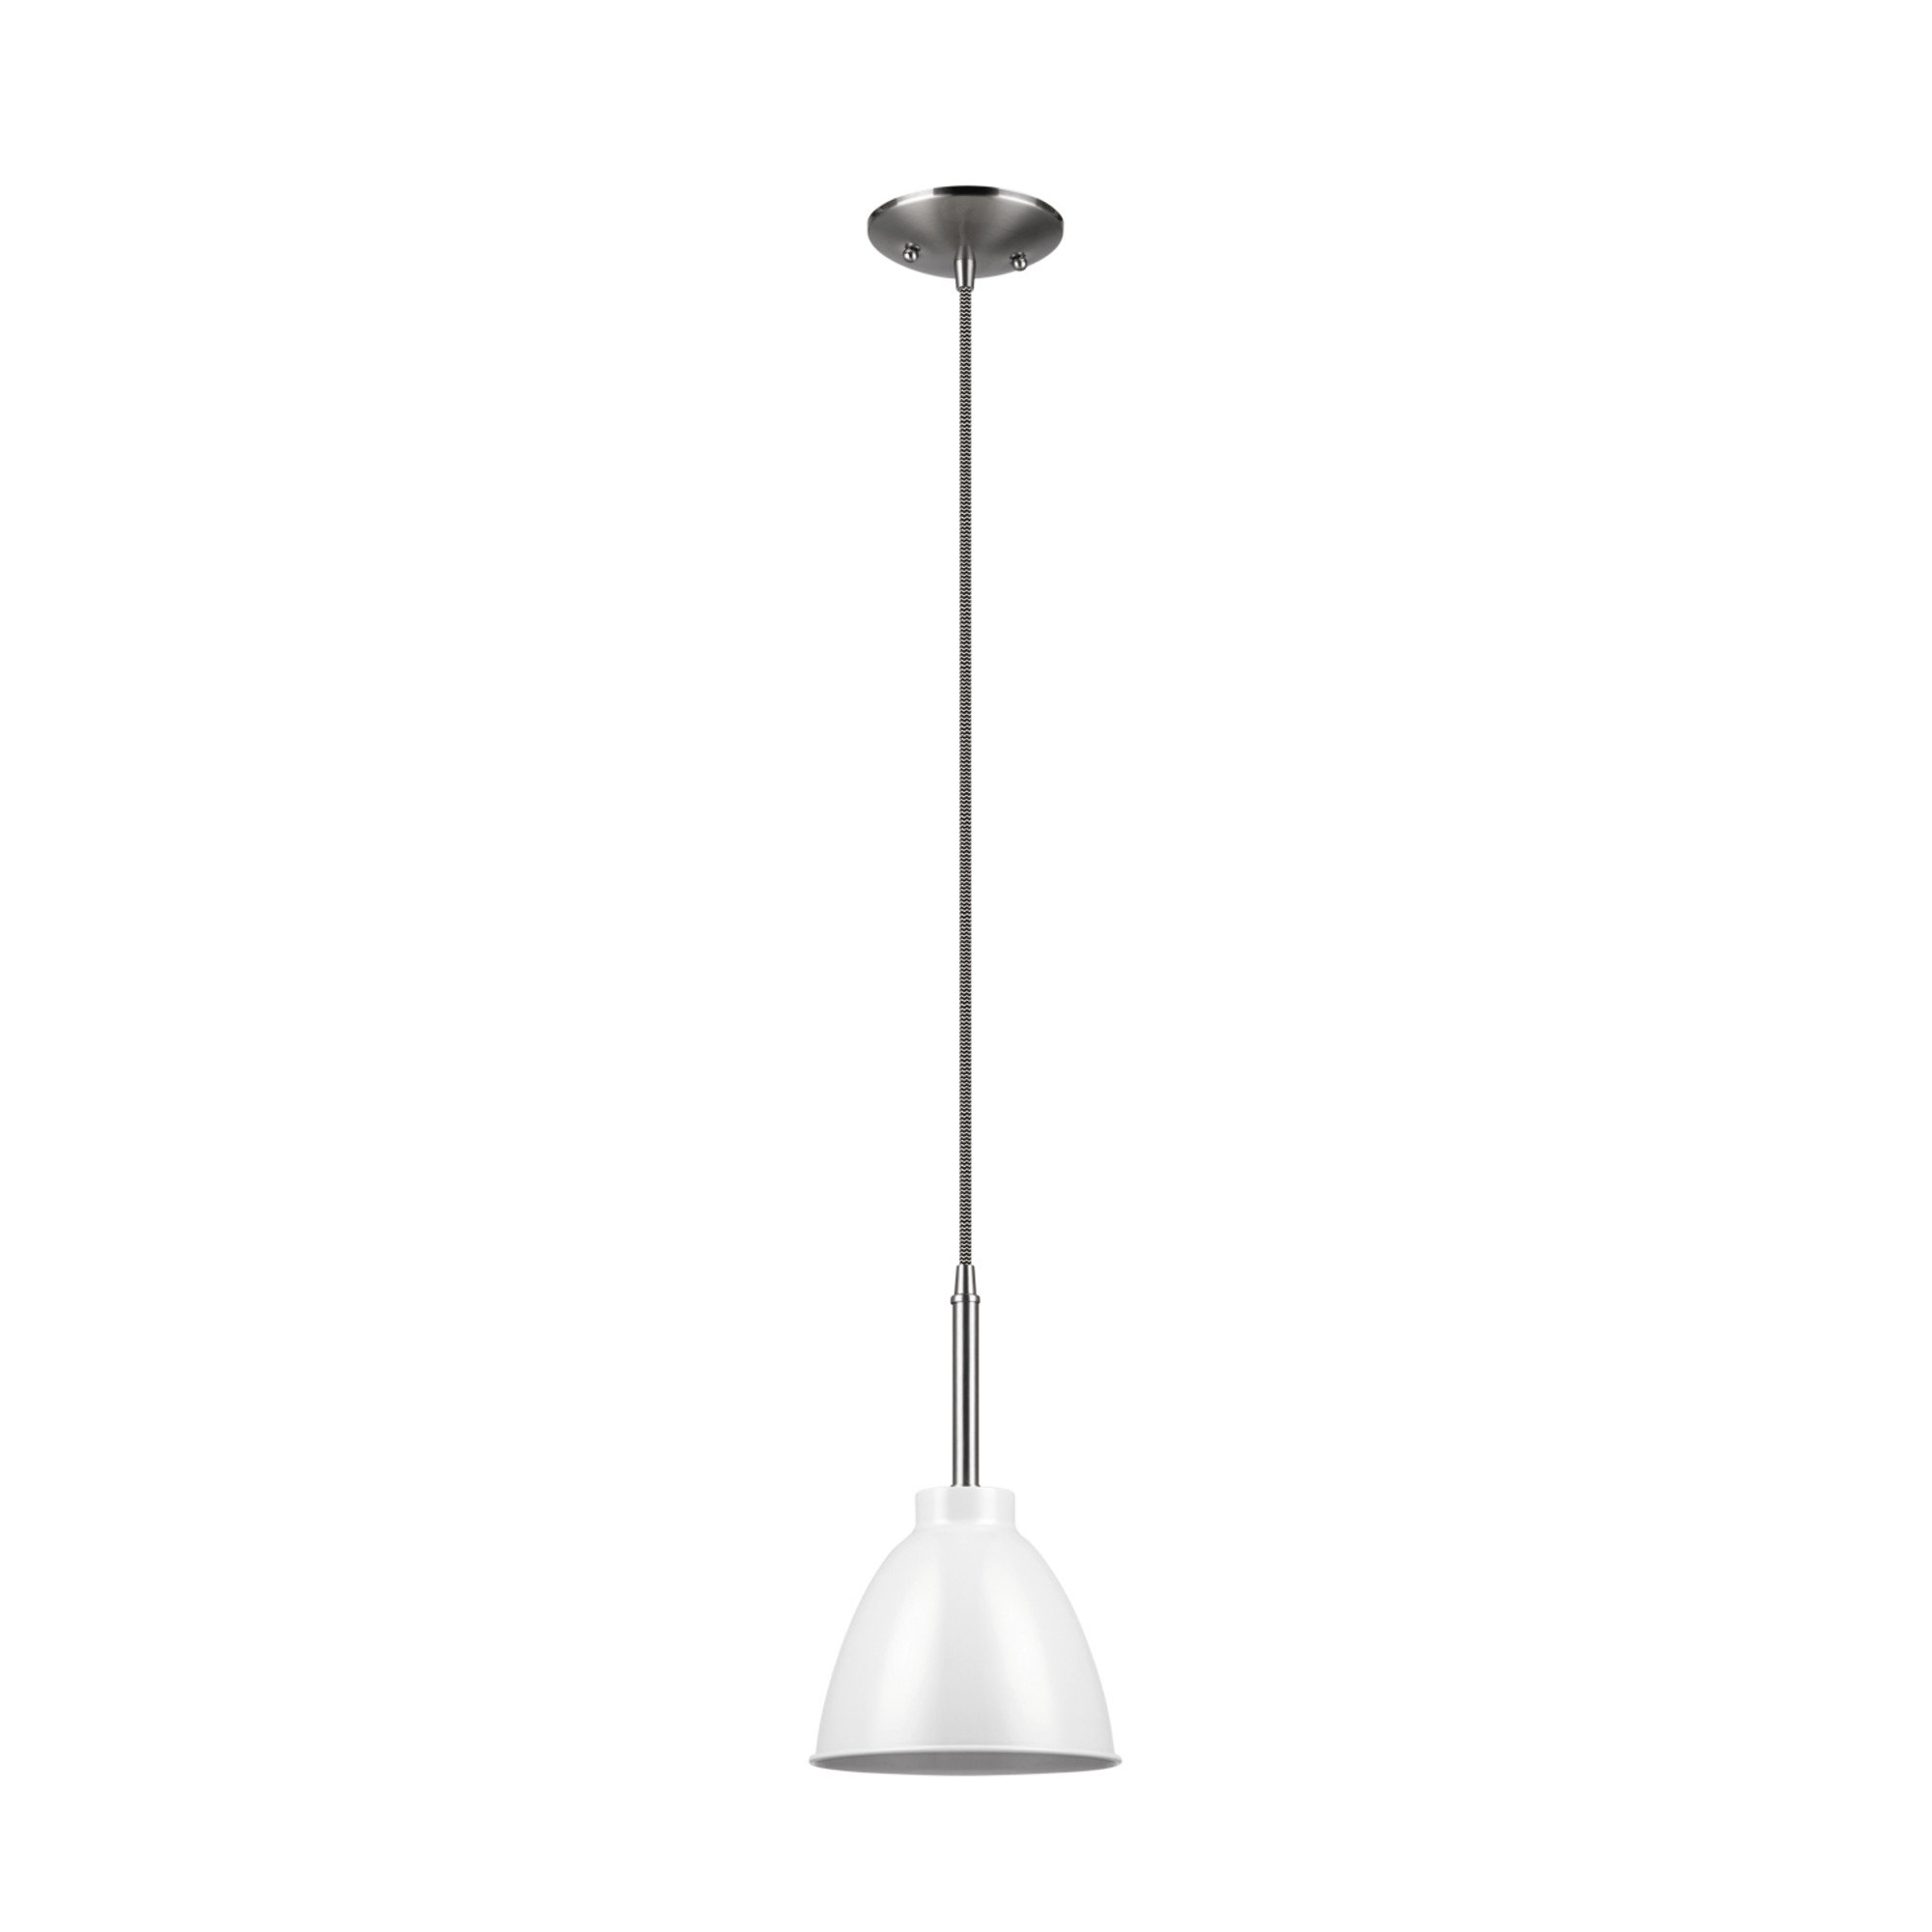 2020 1-Light Single Bell Pendants regarding Velda 1-Light Single Bell Pendant